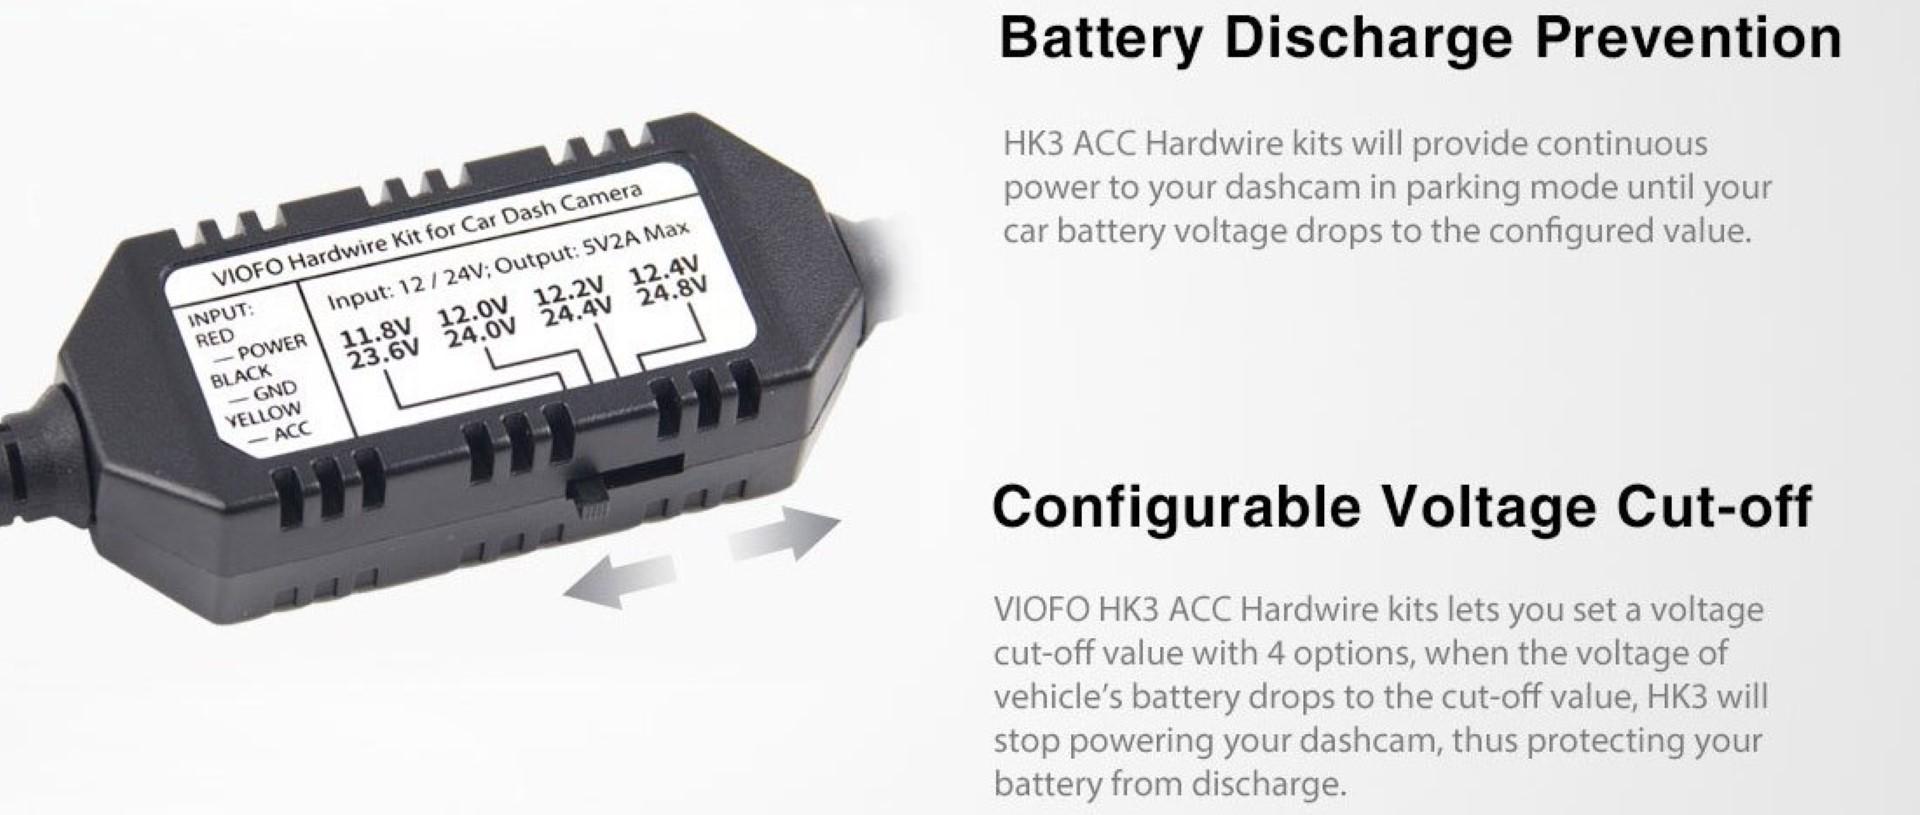 Viofo Hardwire Kit HK3 for Viofo Dashcam A129 A119